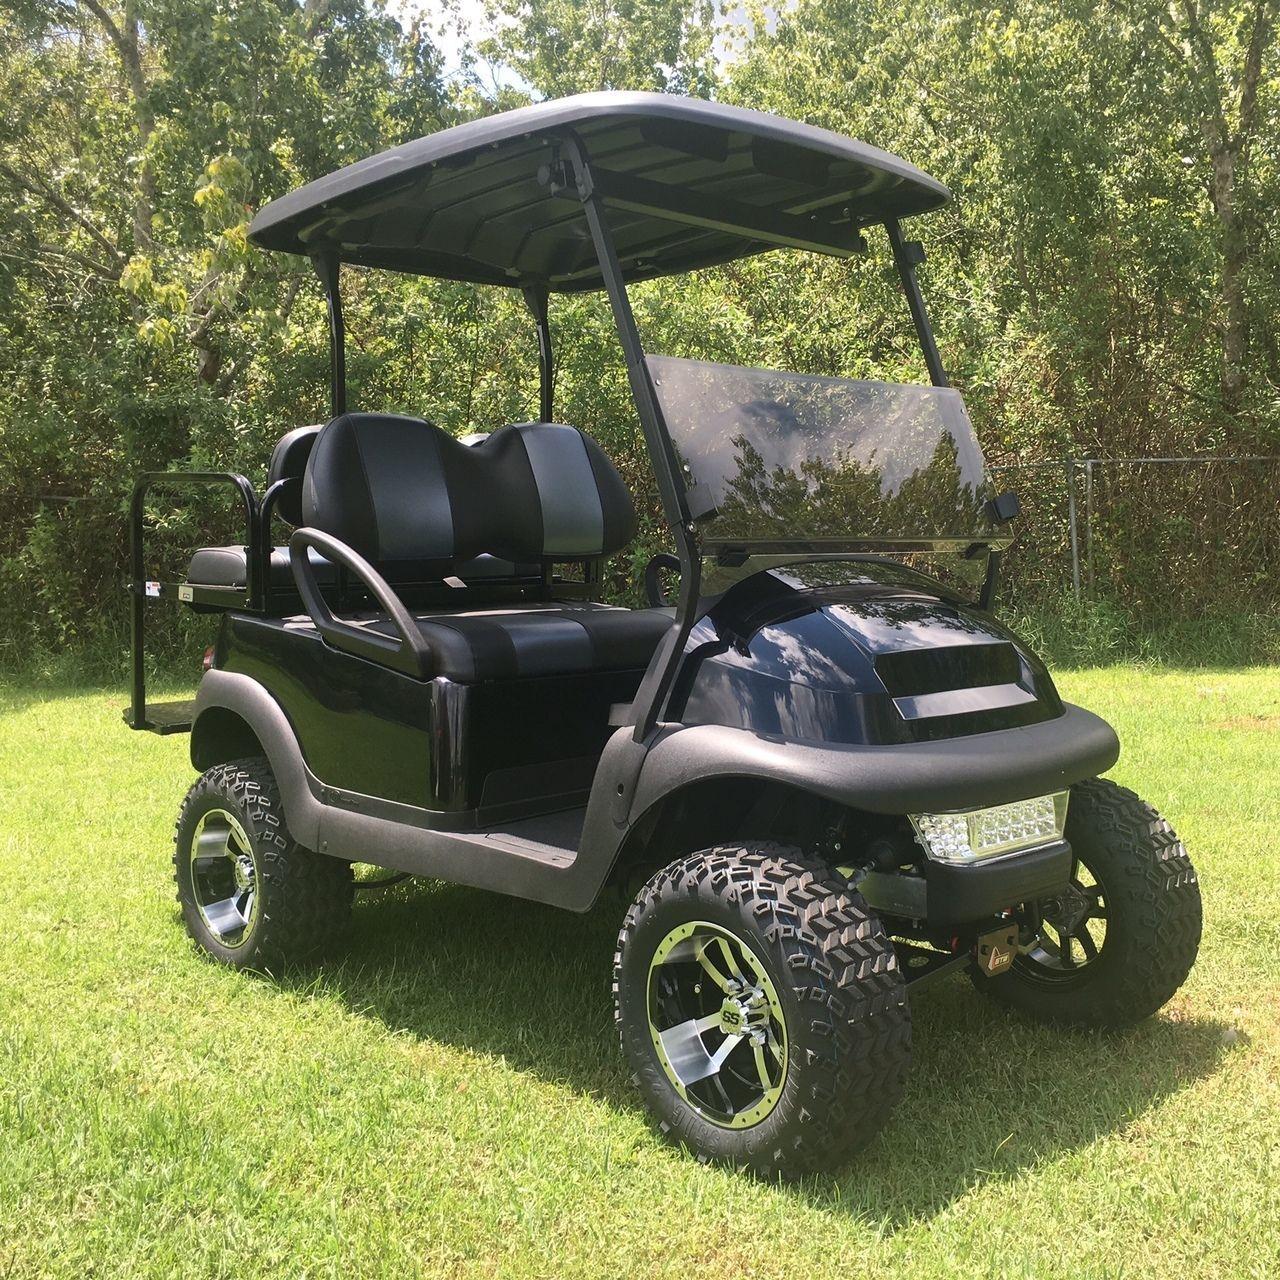 Club Car Precedent 4 Passenger Golf Cart Lifted Black Golf Cart Free Shipping 17l Blk Golf Carts Golf Cart Accessories Club Car Golf Cart